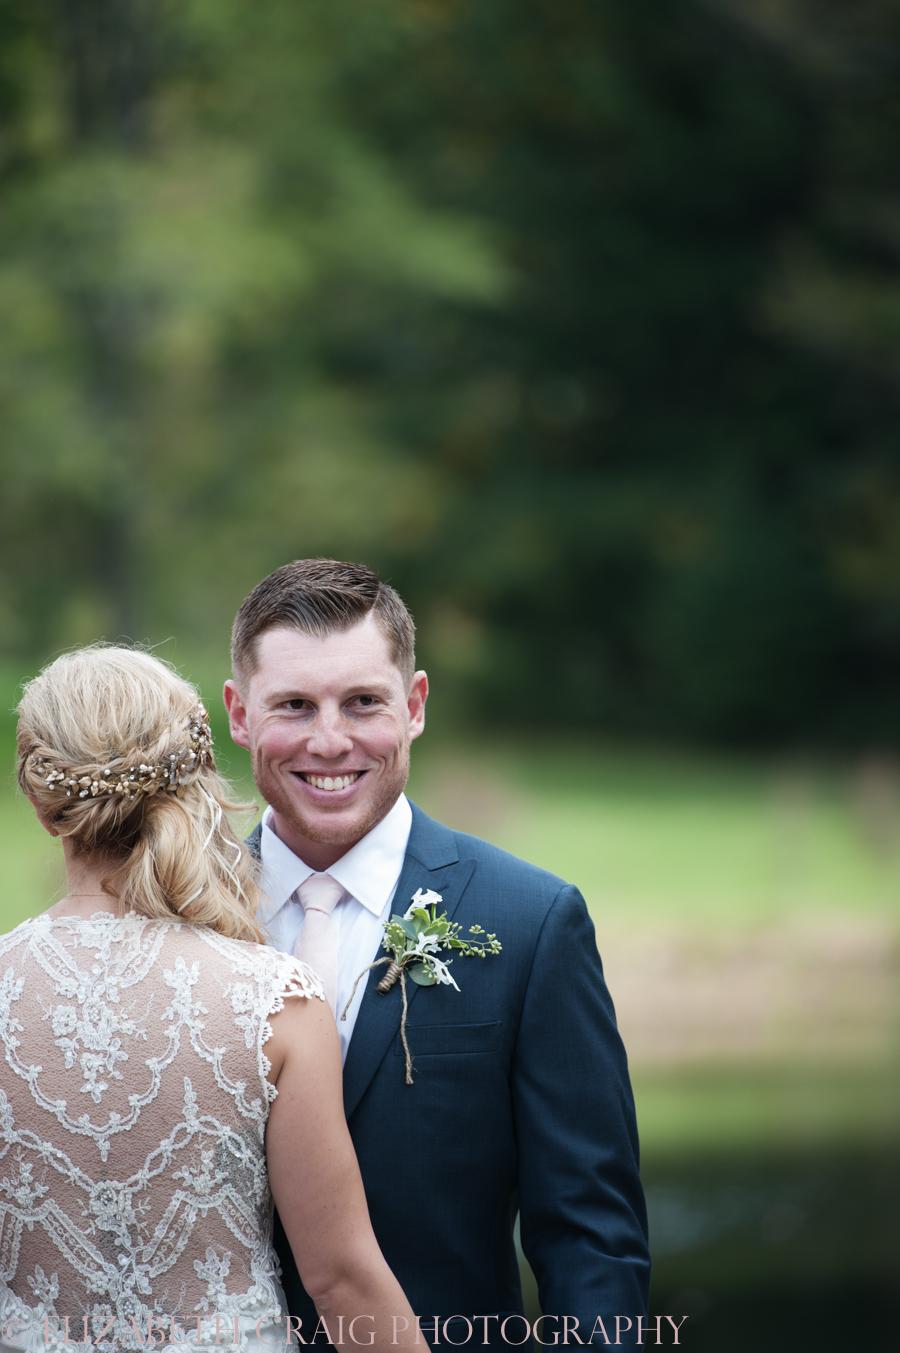 Dubois Brockway St. Marys PA Weddings-0117